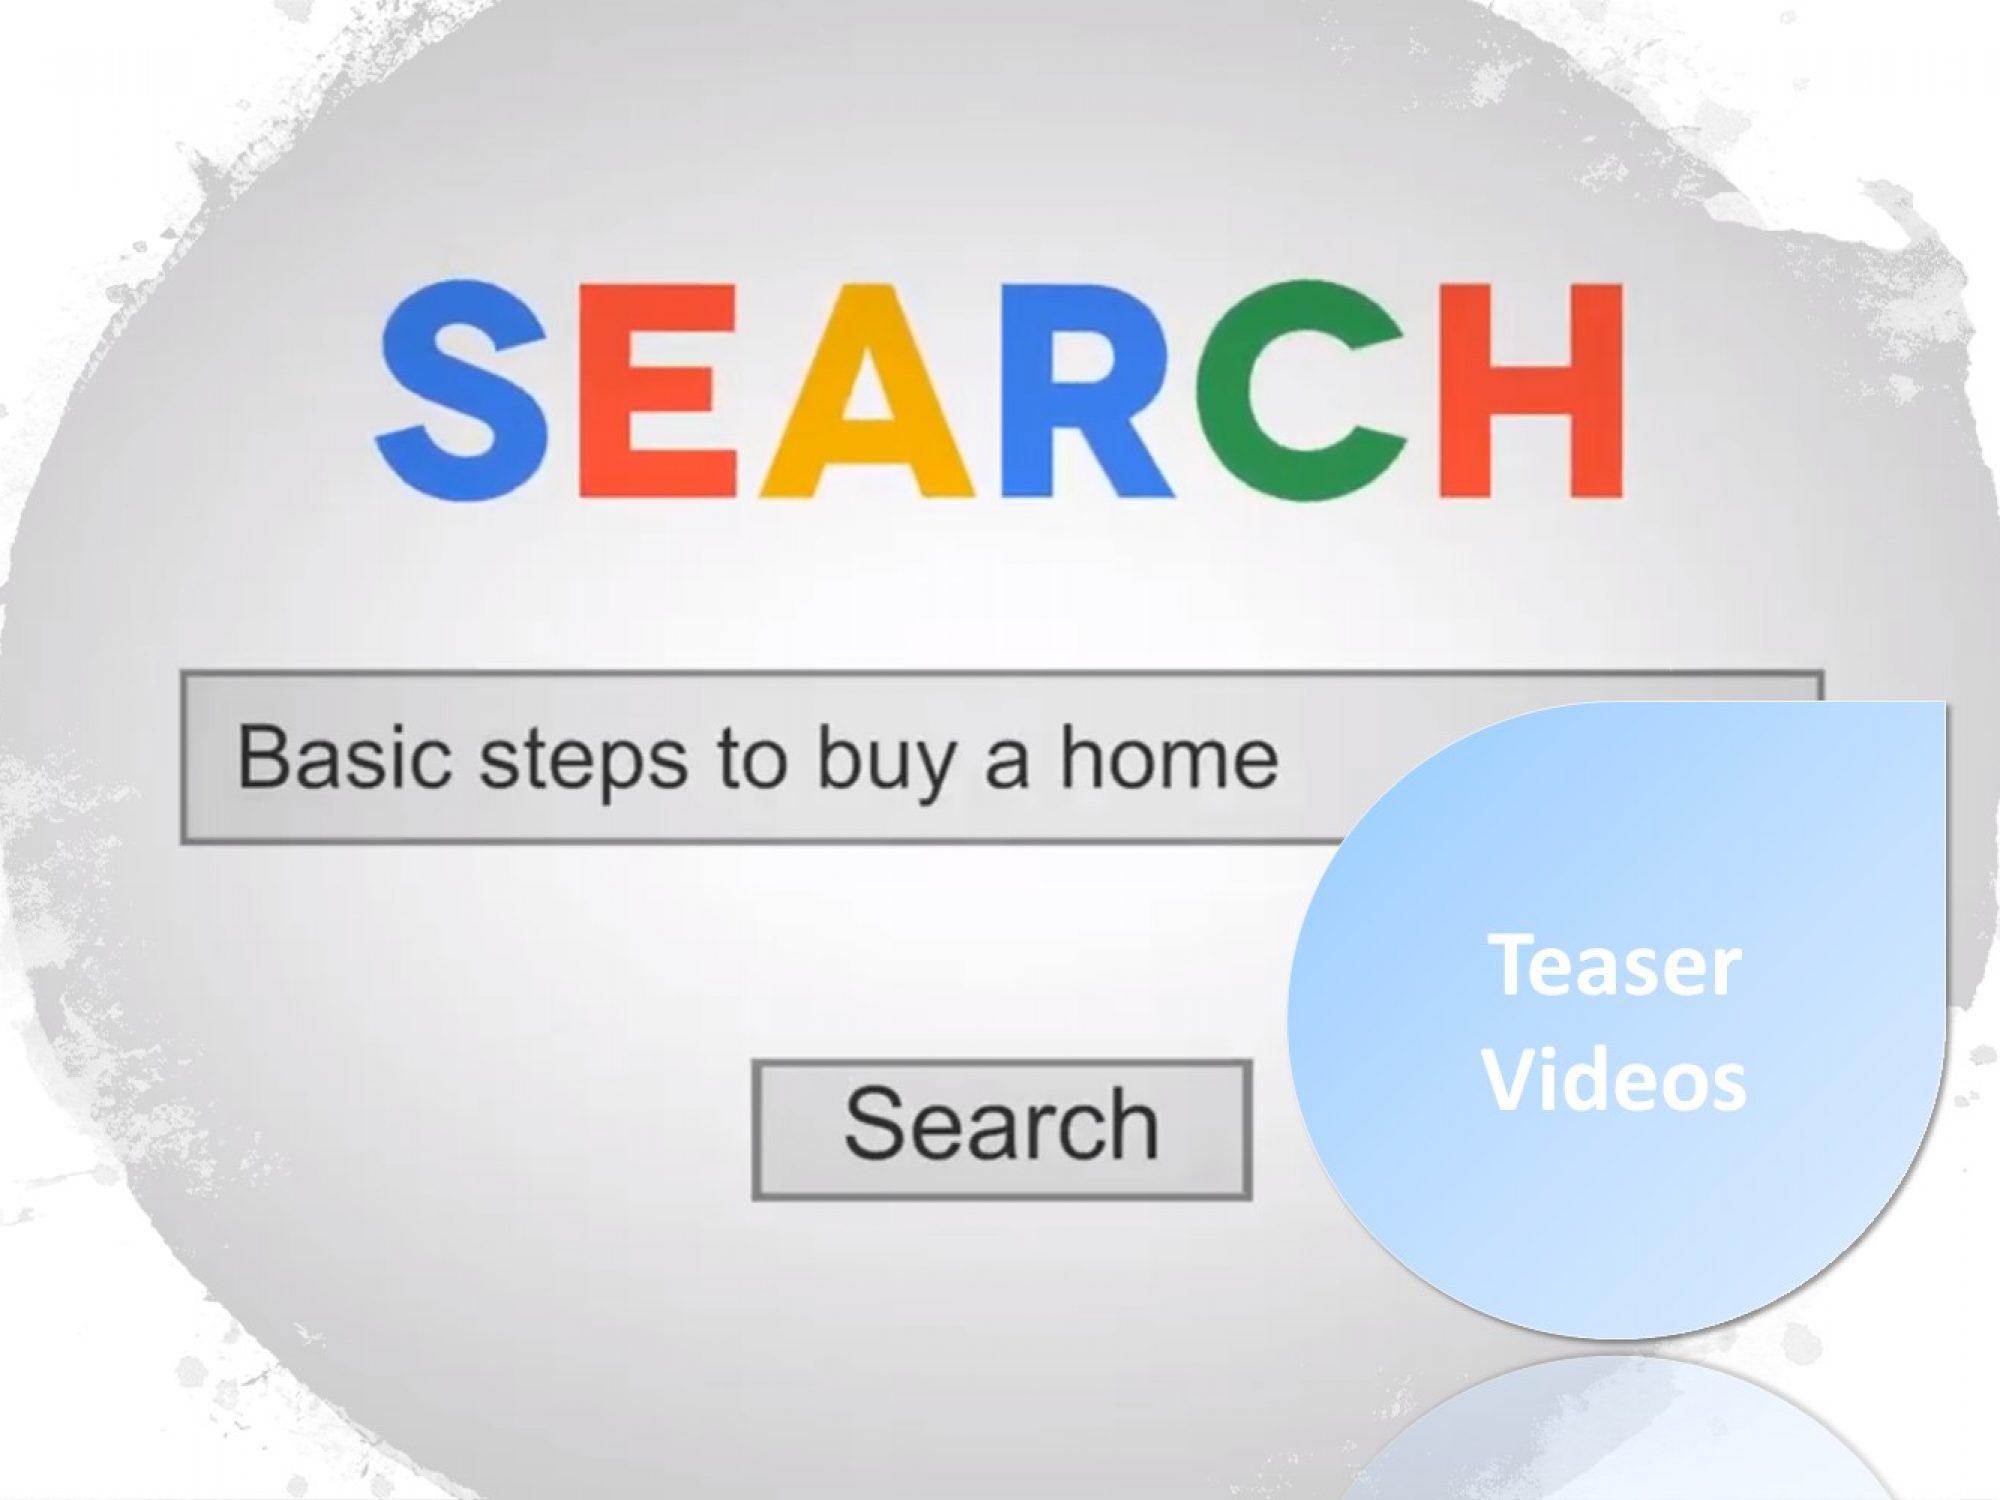 Teaser Videos